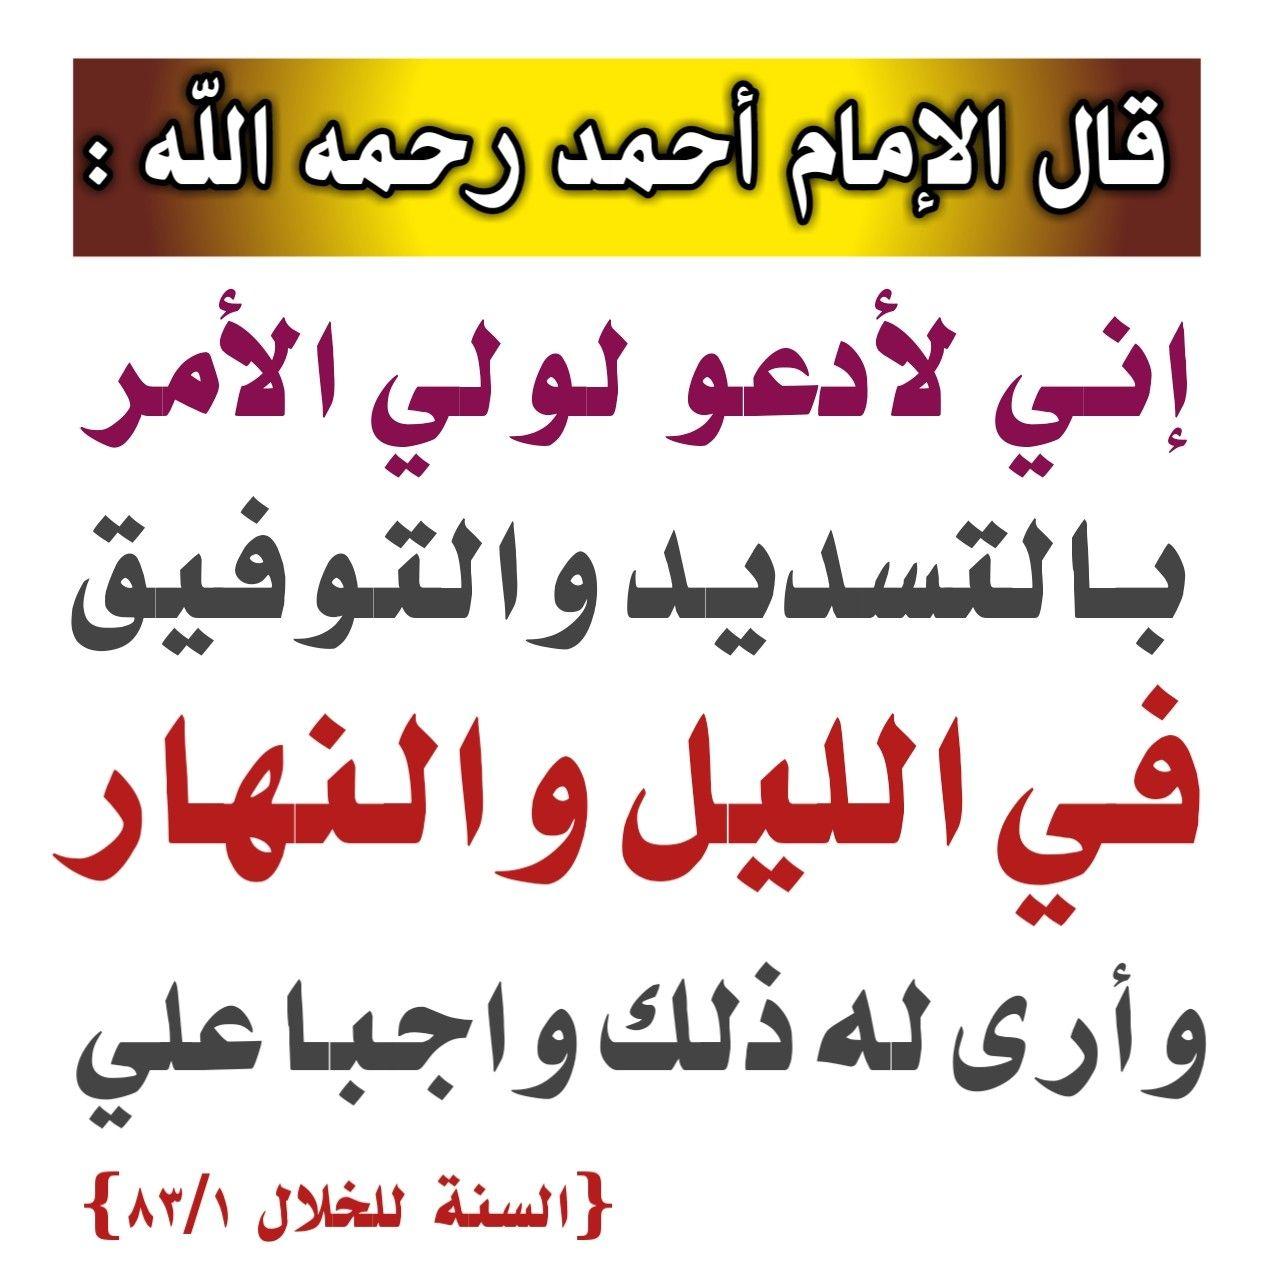 Pin By أدعية وأذكار Adiyaa W Azkar On بطاقات العلم الشرعي وفتاوى العلماء Quotes Arabic Calligraphy Calligraphy